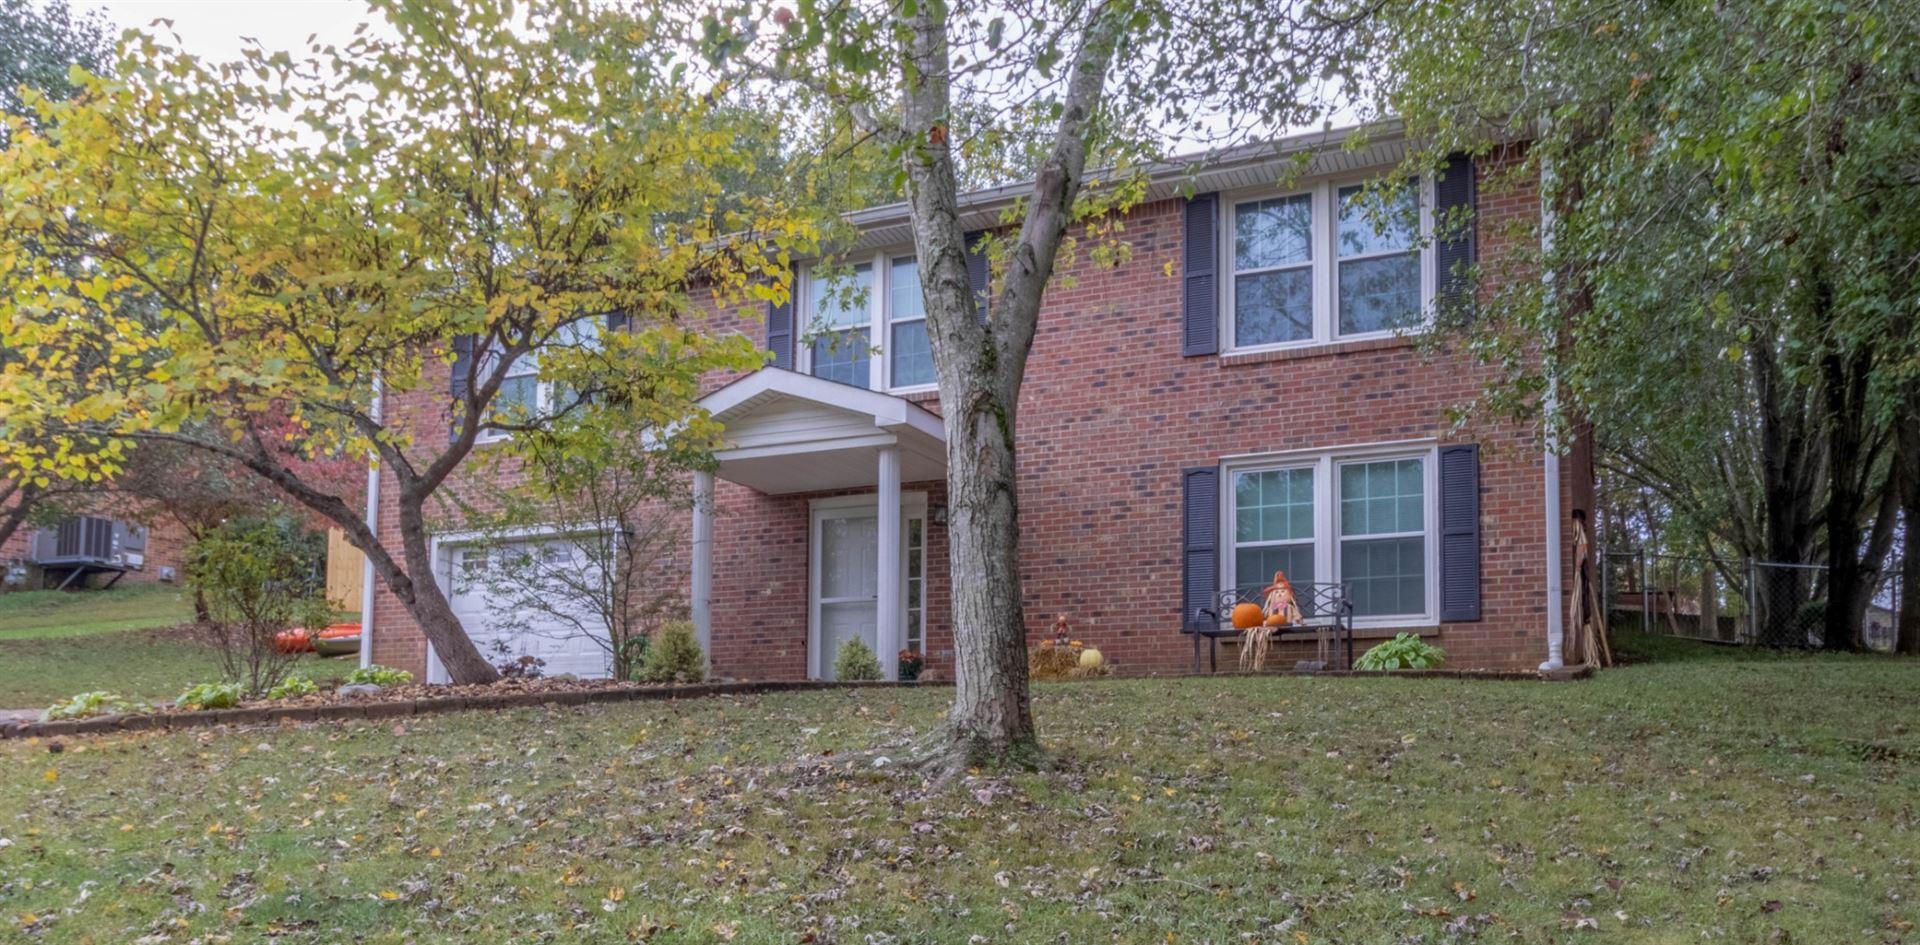 404 Needlewood Dr, Clarksville, TN 37040 - MLS#: 2200055